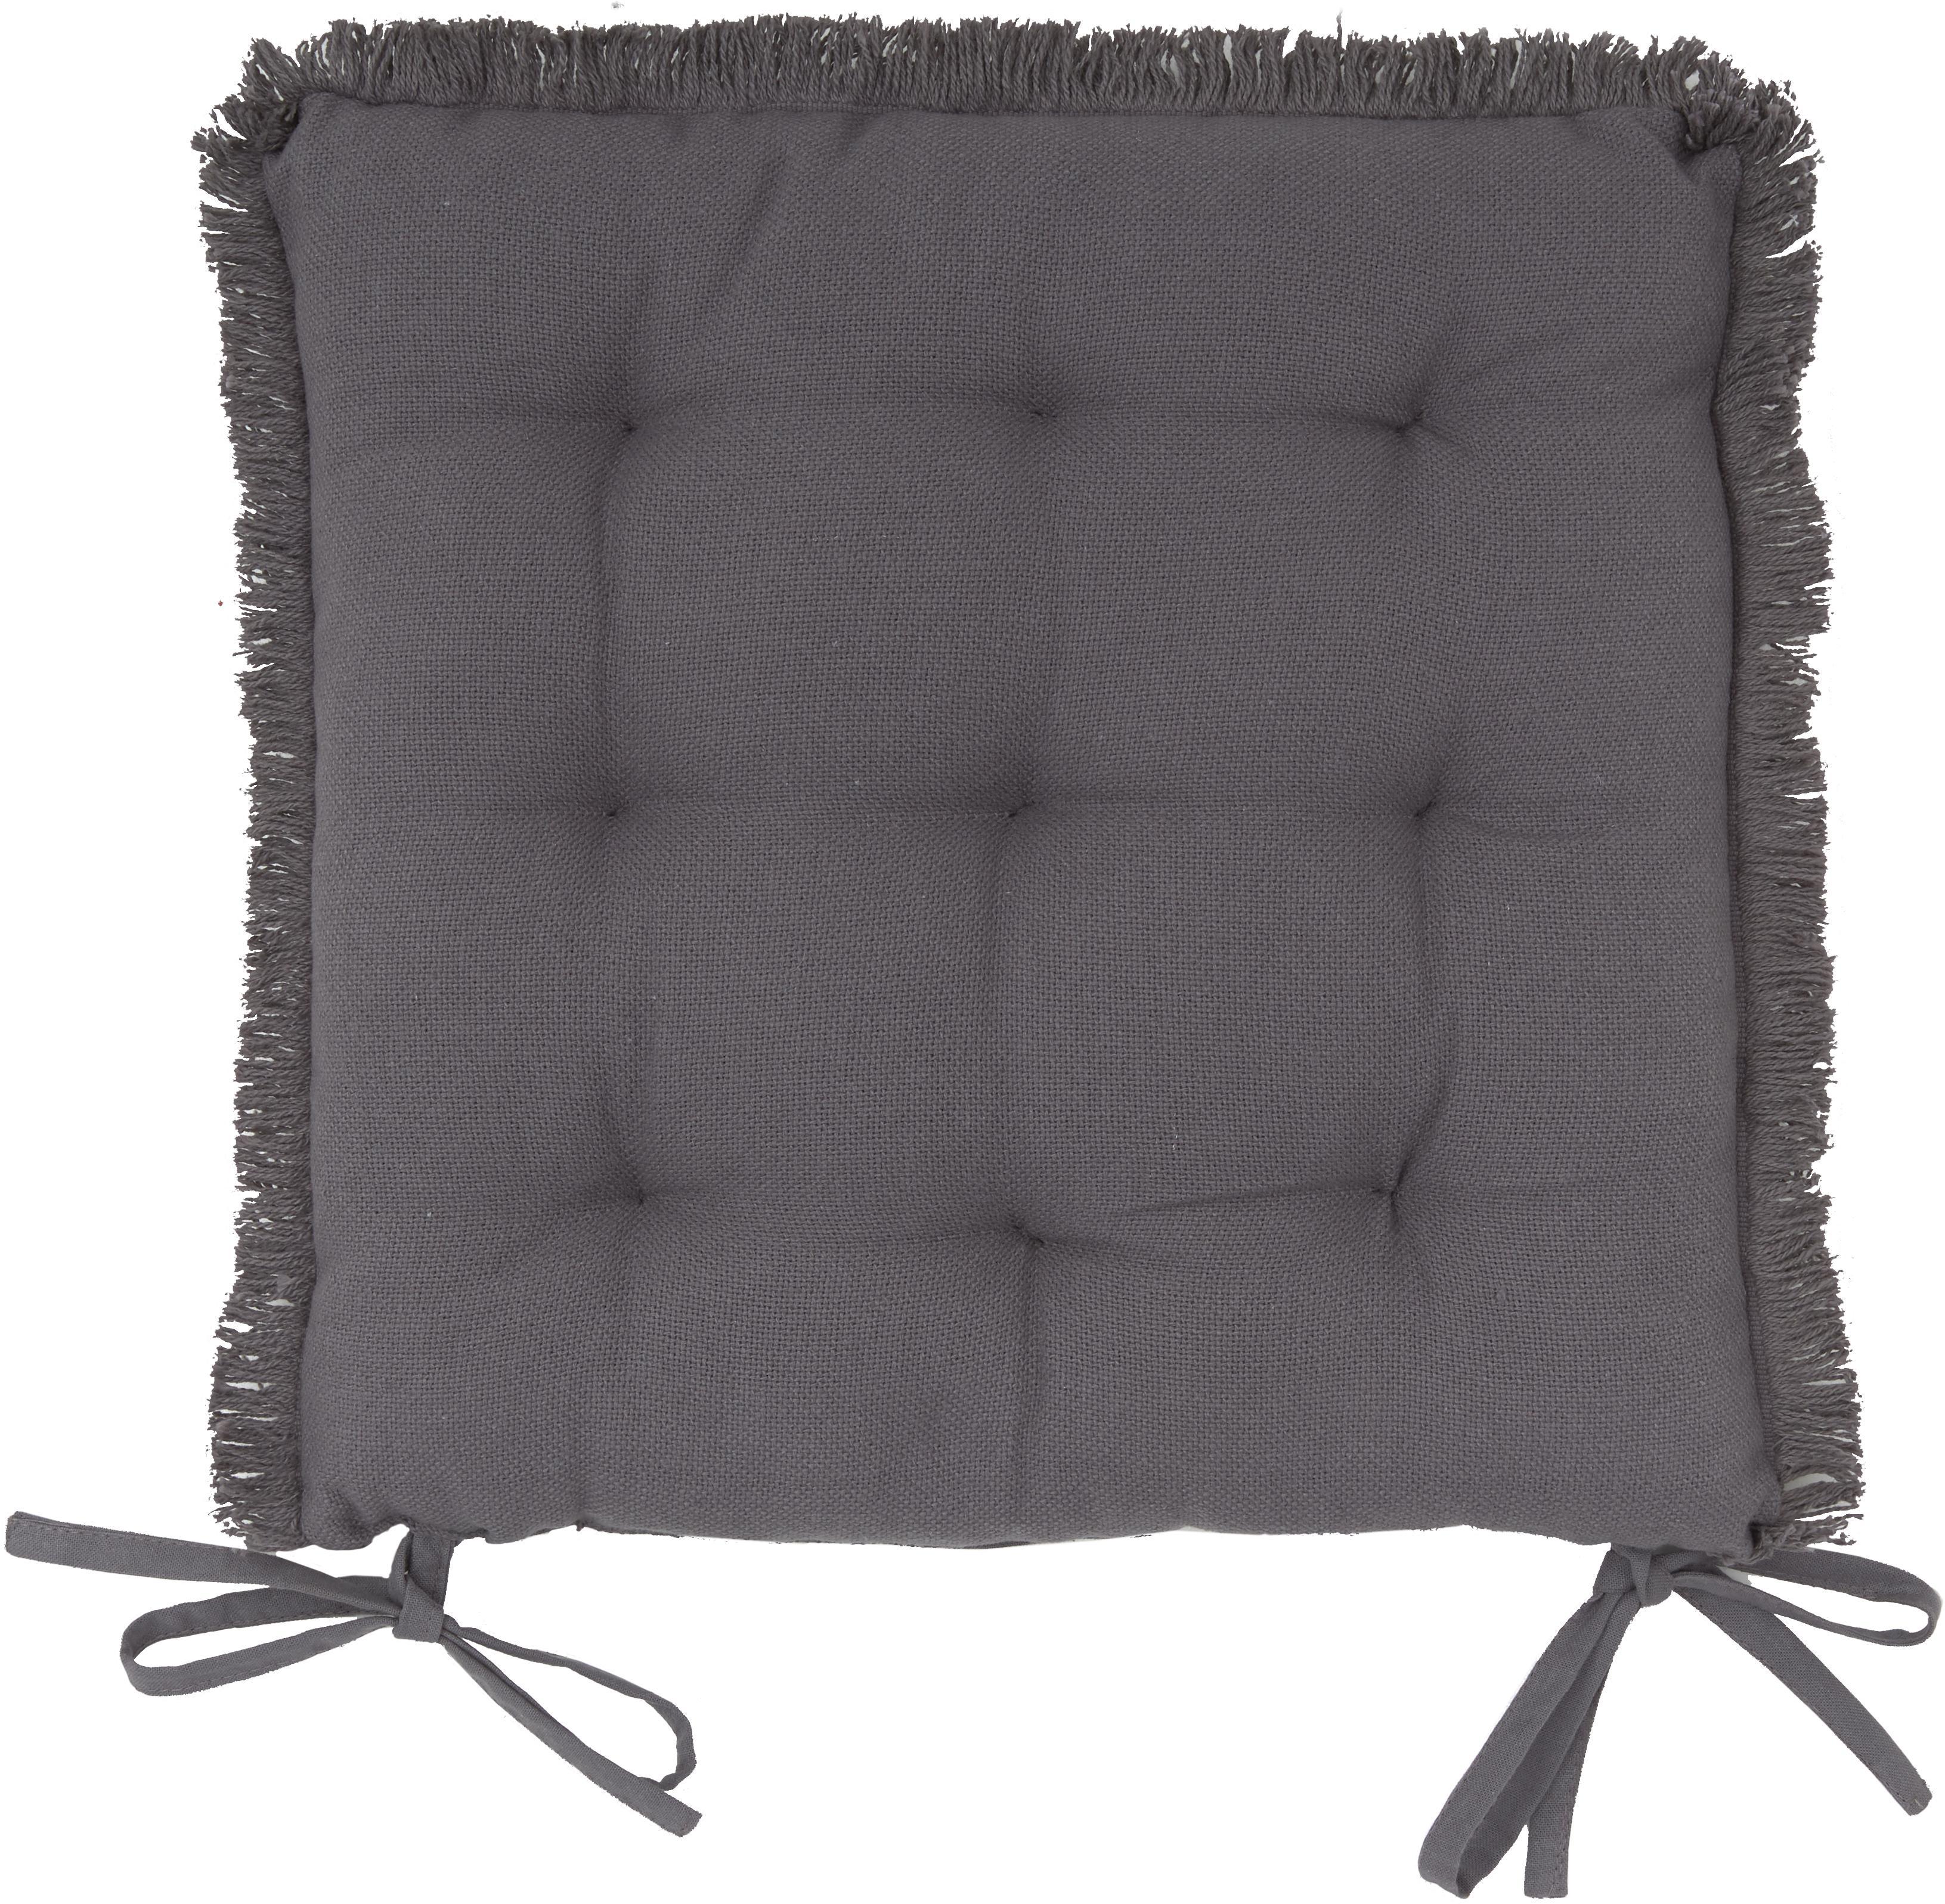 Cuscino sedia con finitura a frange  Prague, Antracite, Larg. 40 x Lung. 40 cm